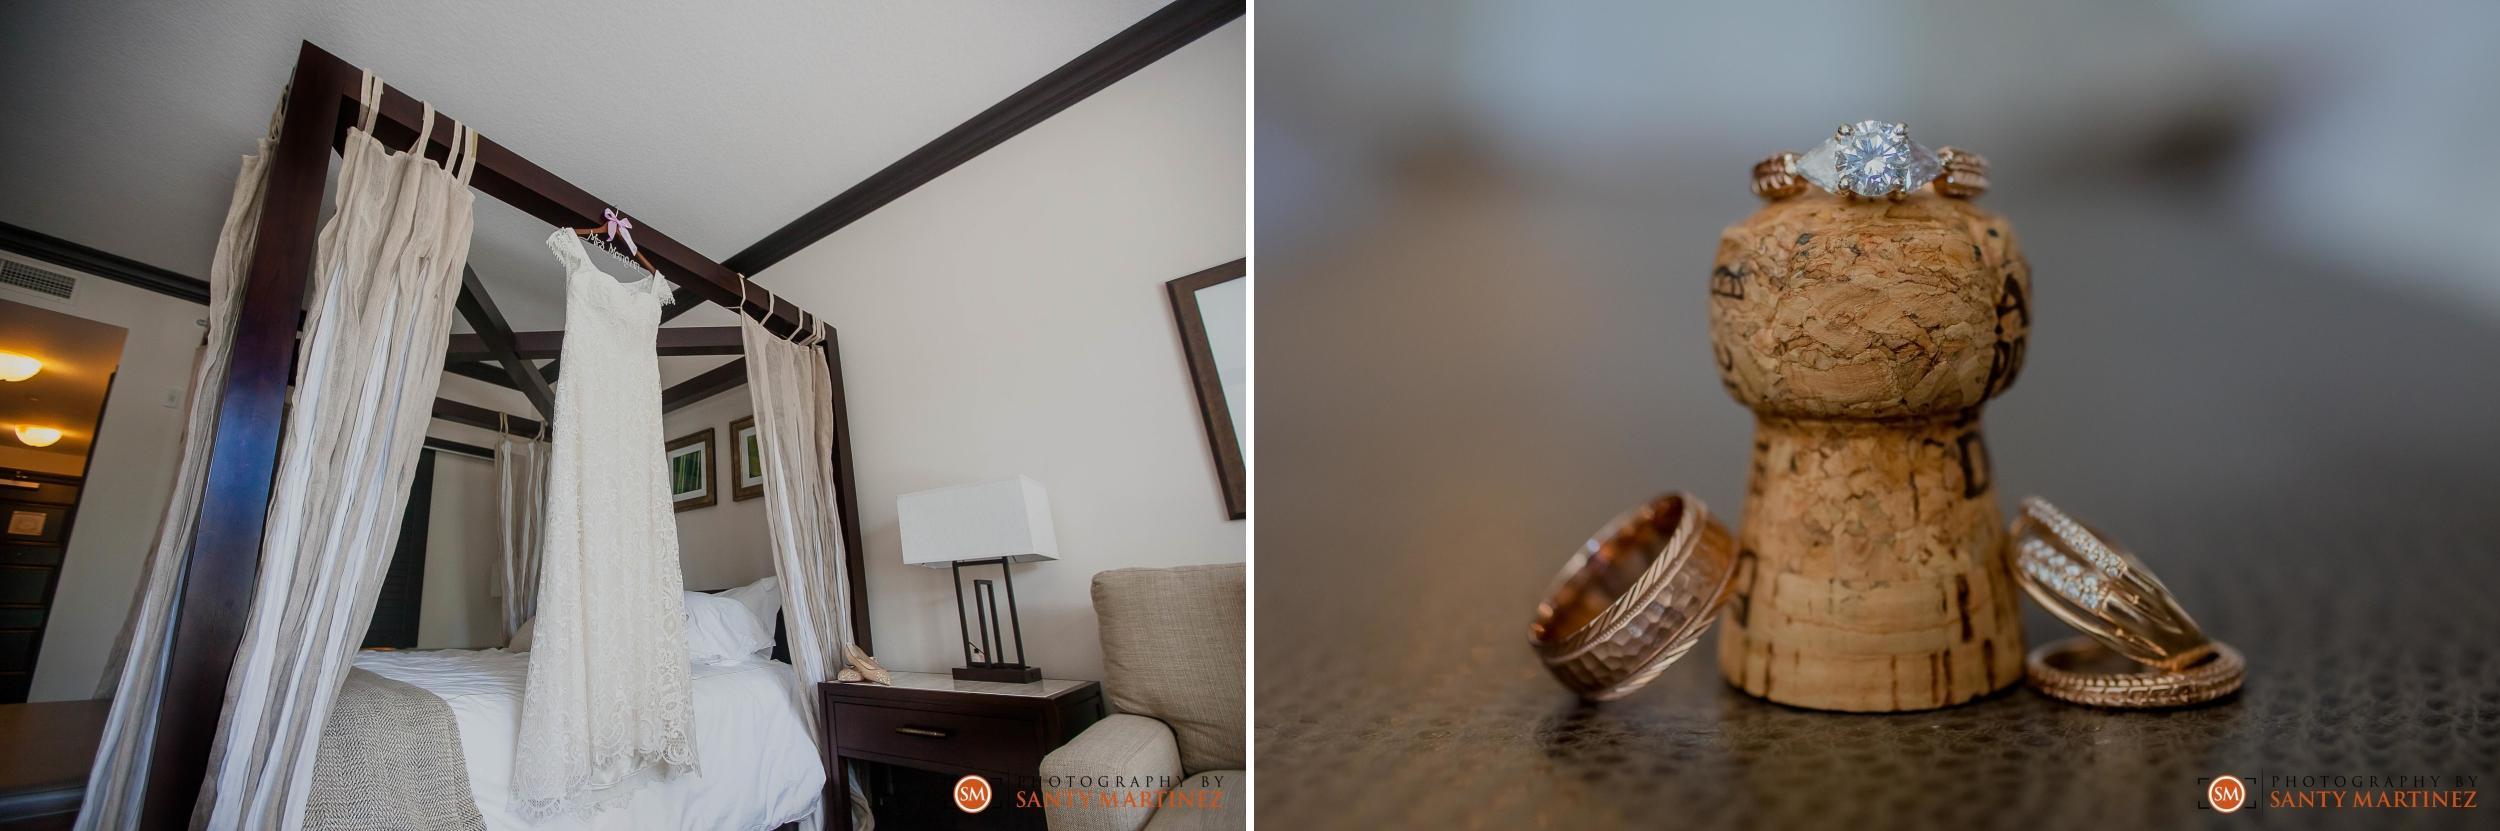 Wedding - Seagate Beach Club - Hotel - Delray Beach - Santy Martinez Photography 1.jpg